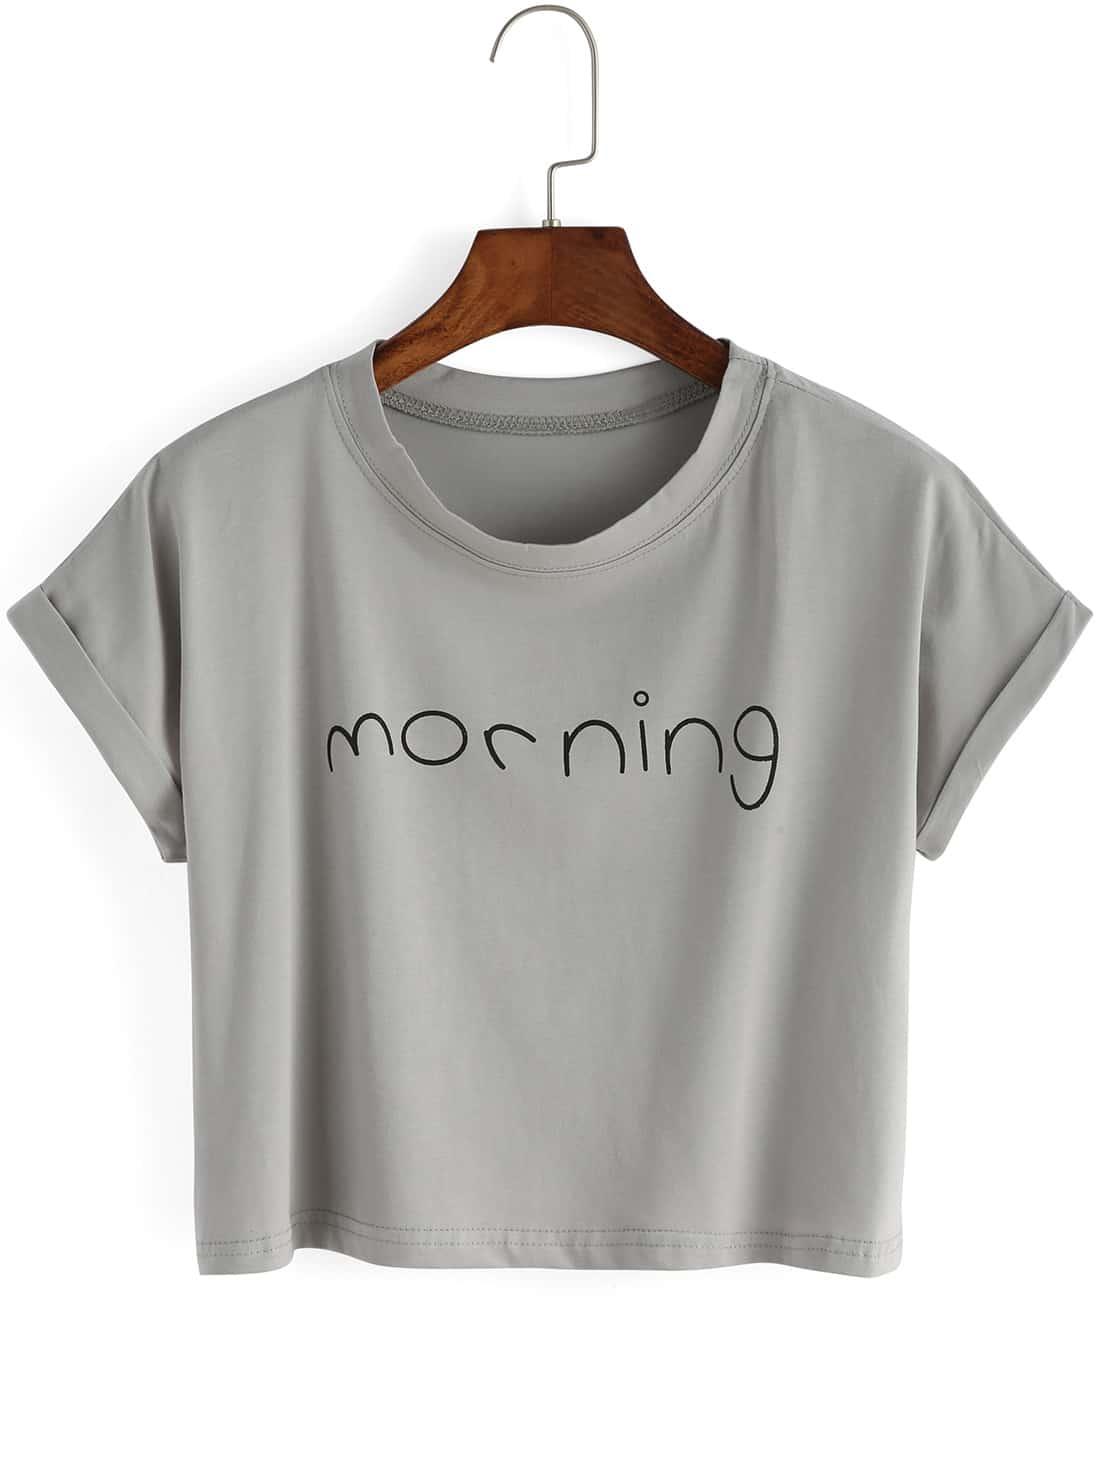 Grey Crew Neck Letters Print Crop T-Shirt grey stripe details crew neck long sleeves t shirt